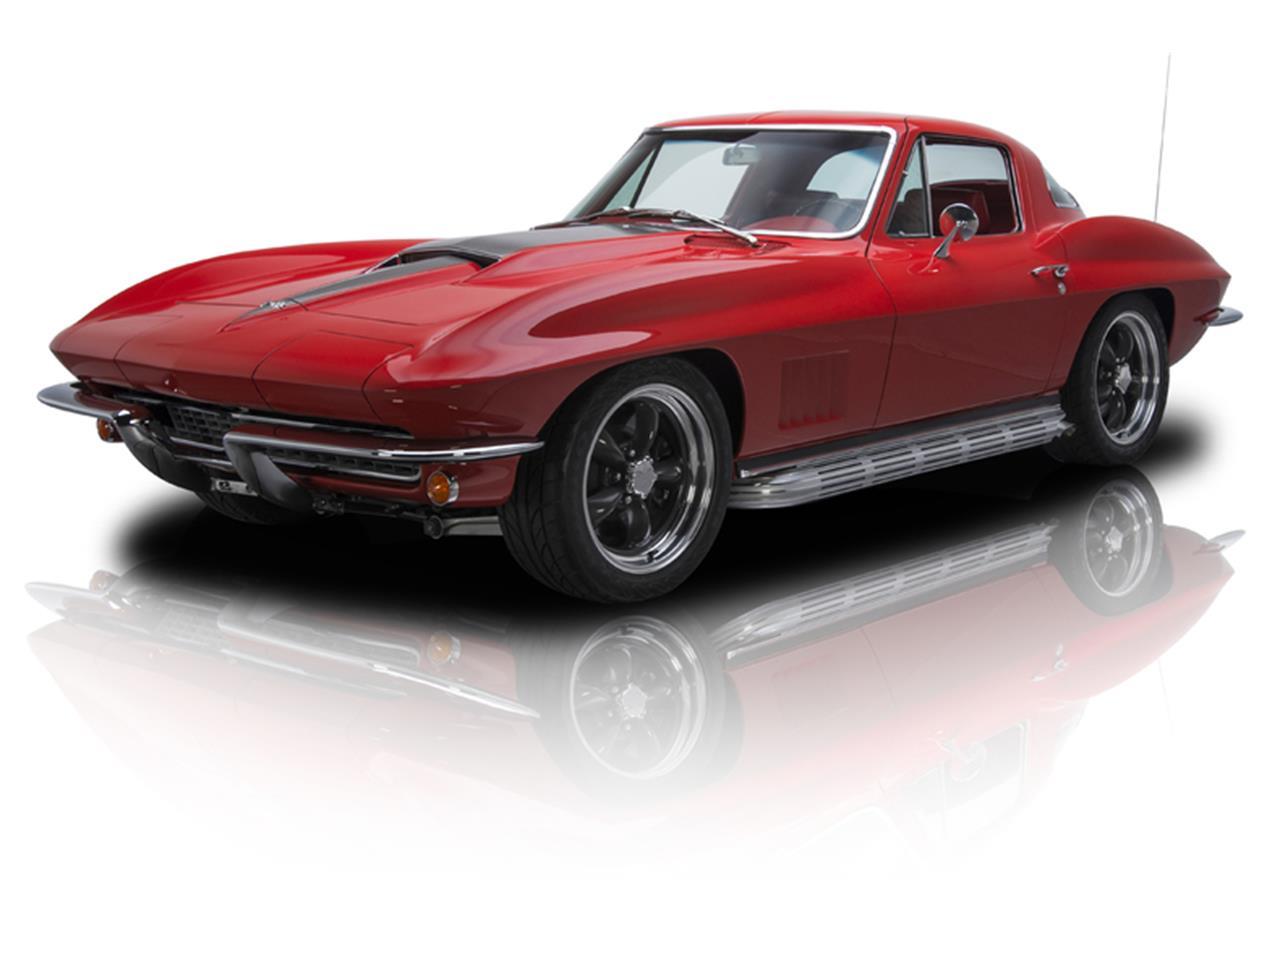 1967 chevrolet corvette stingray for sale cc 932909. Black Bedroom Furniture Sets. Home Design Ideas